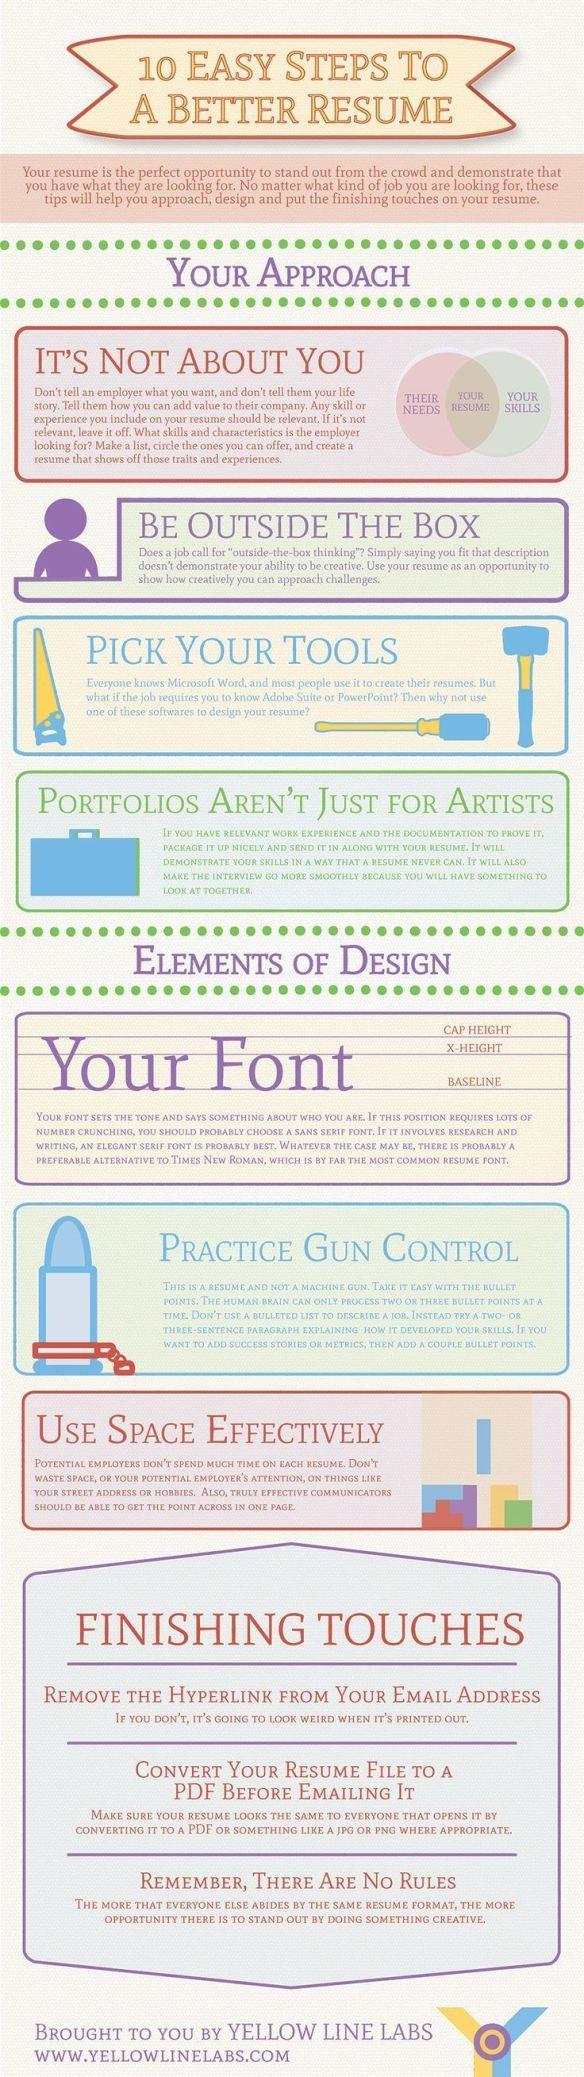 resume infographic resume tips tricks